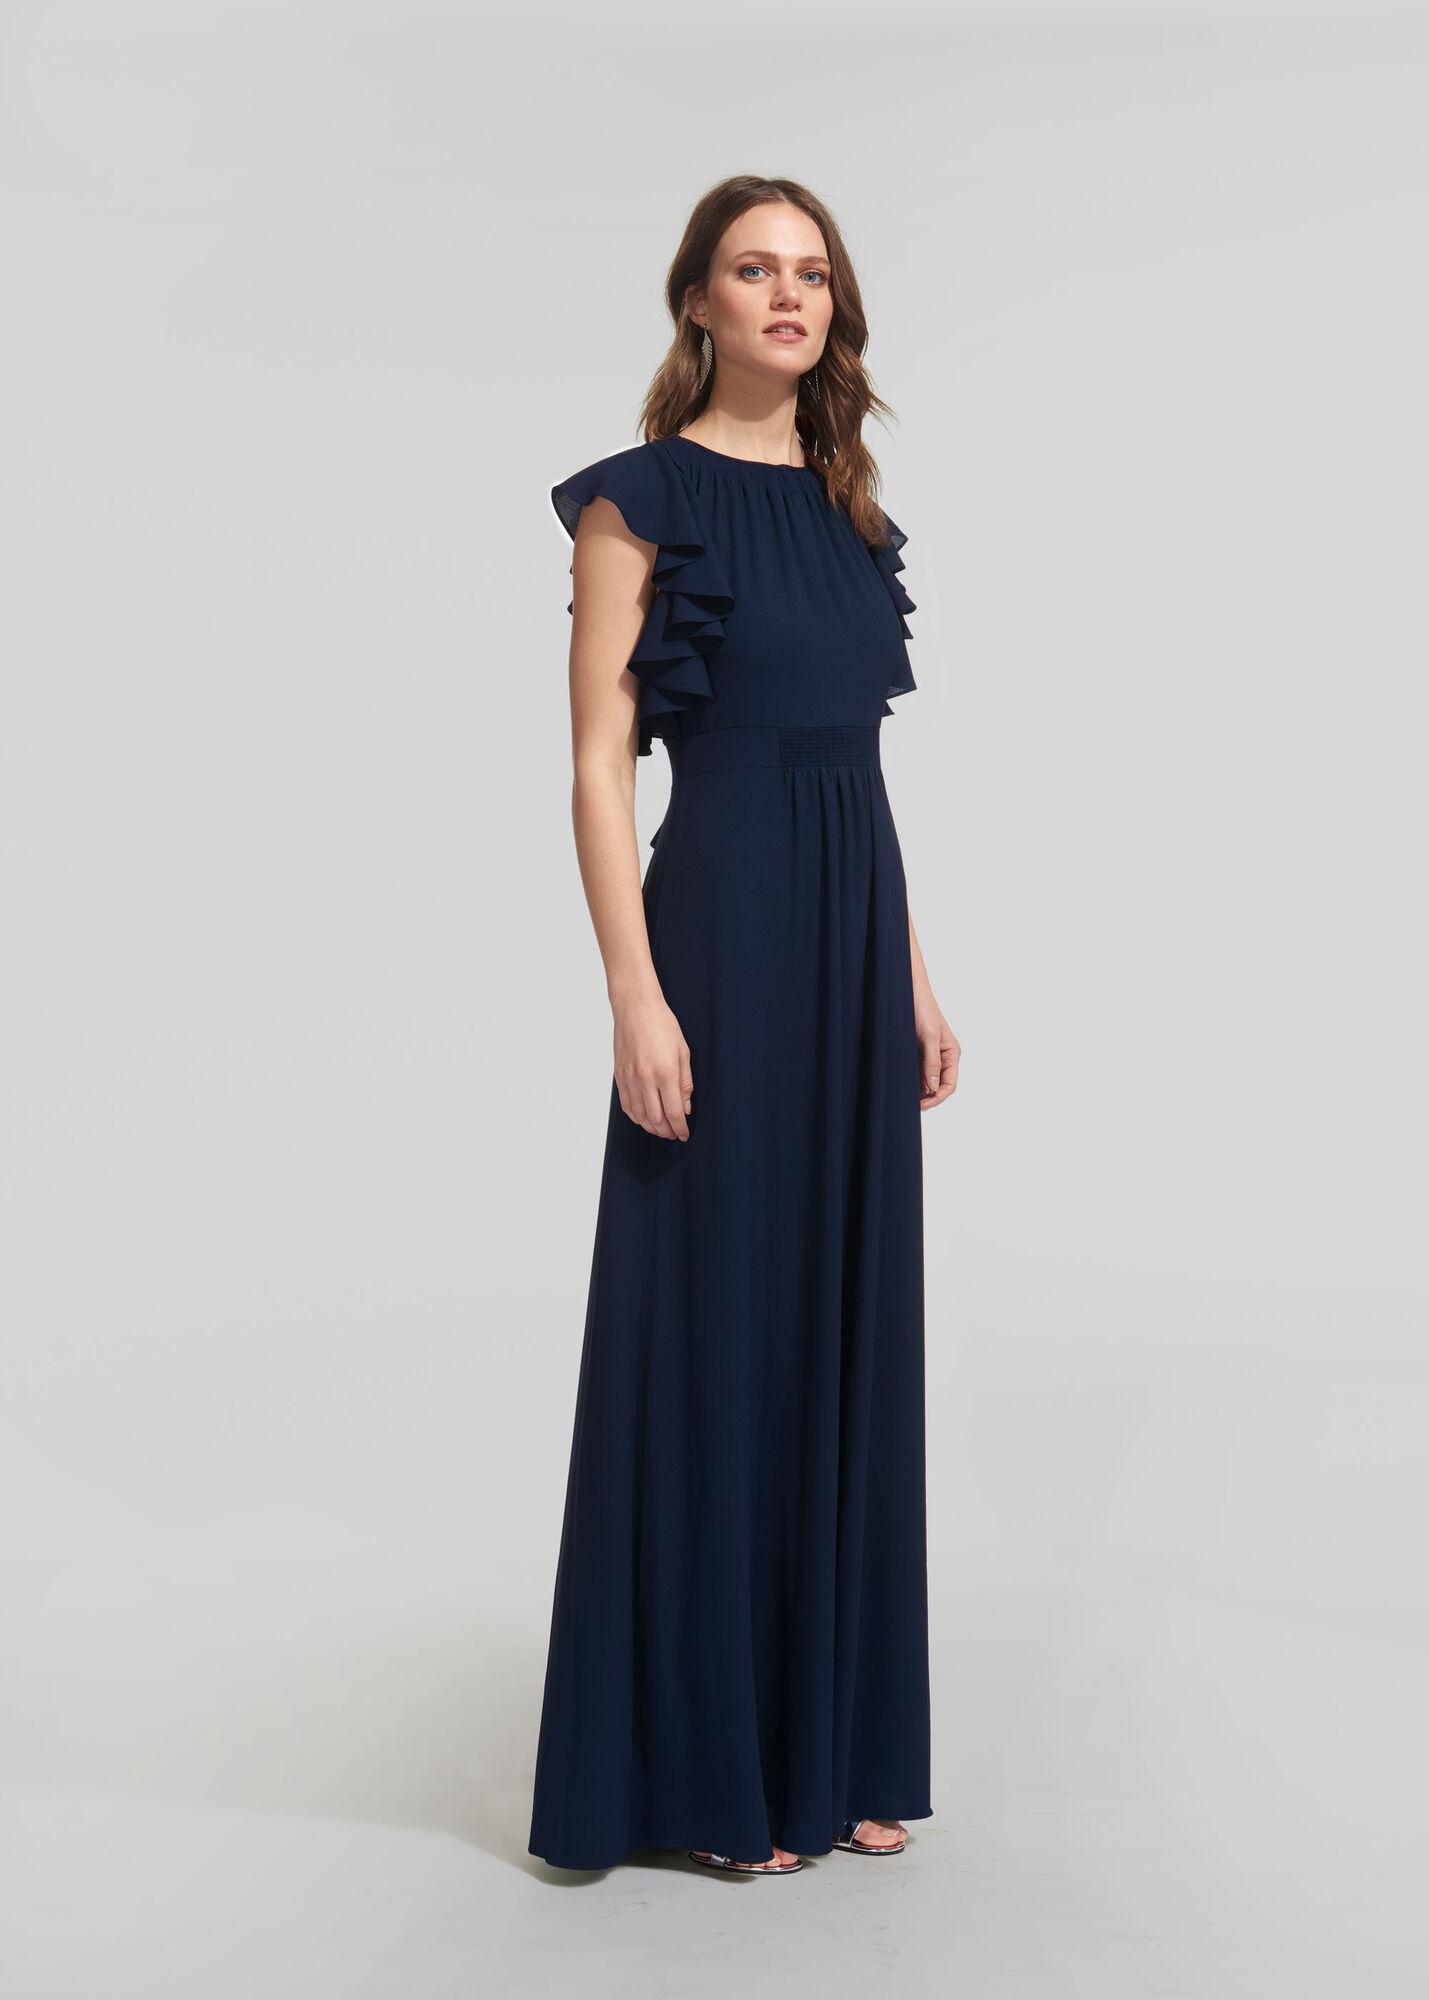 Zyta Frill Maxi Dress